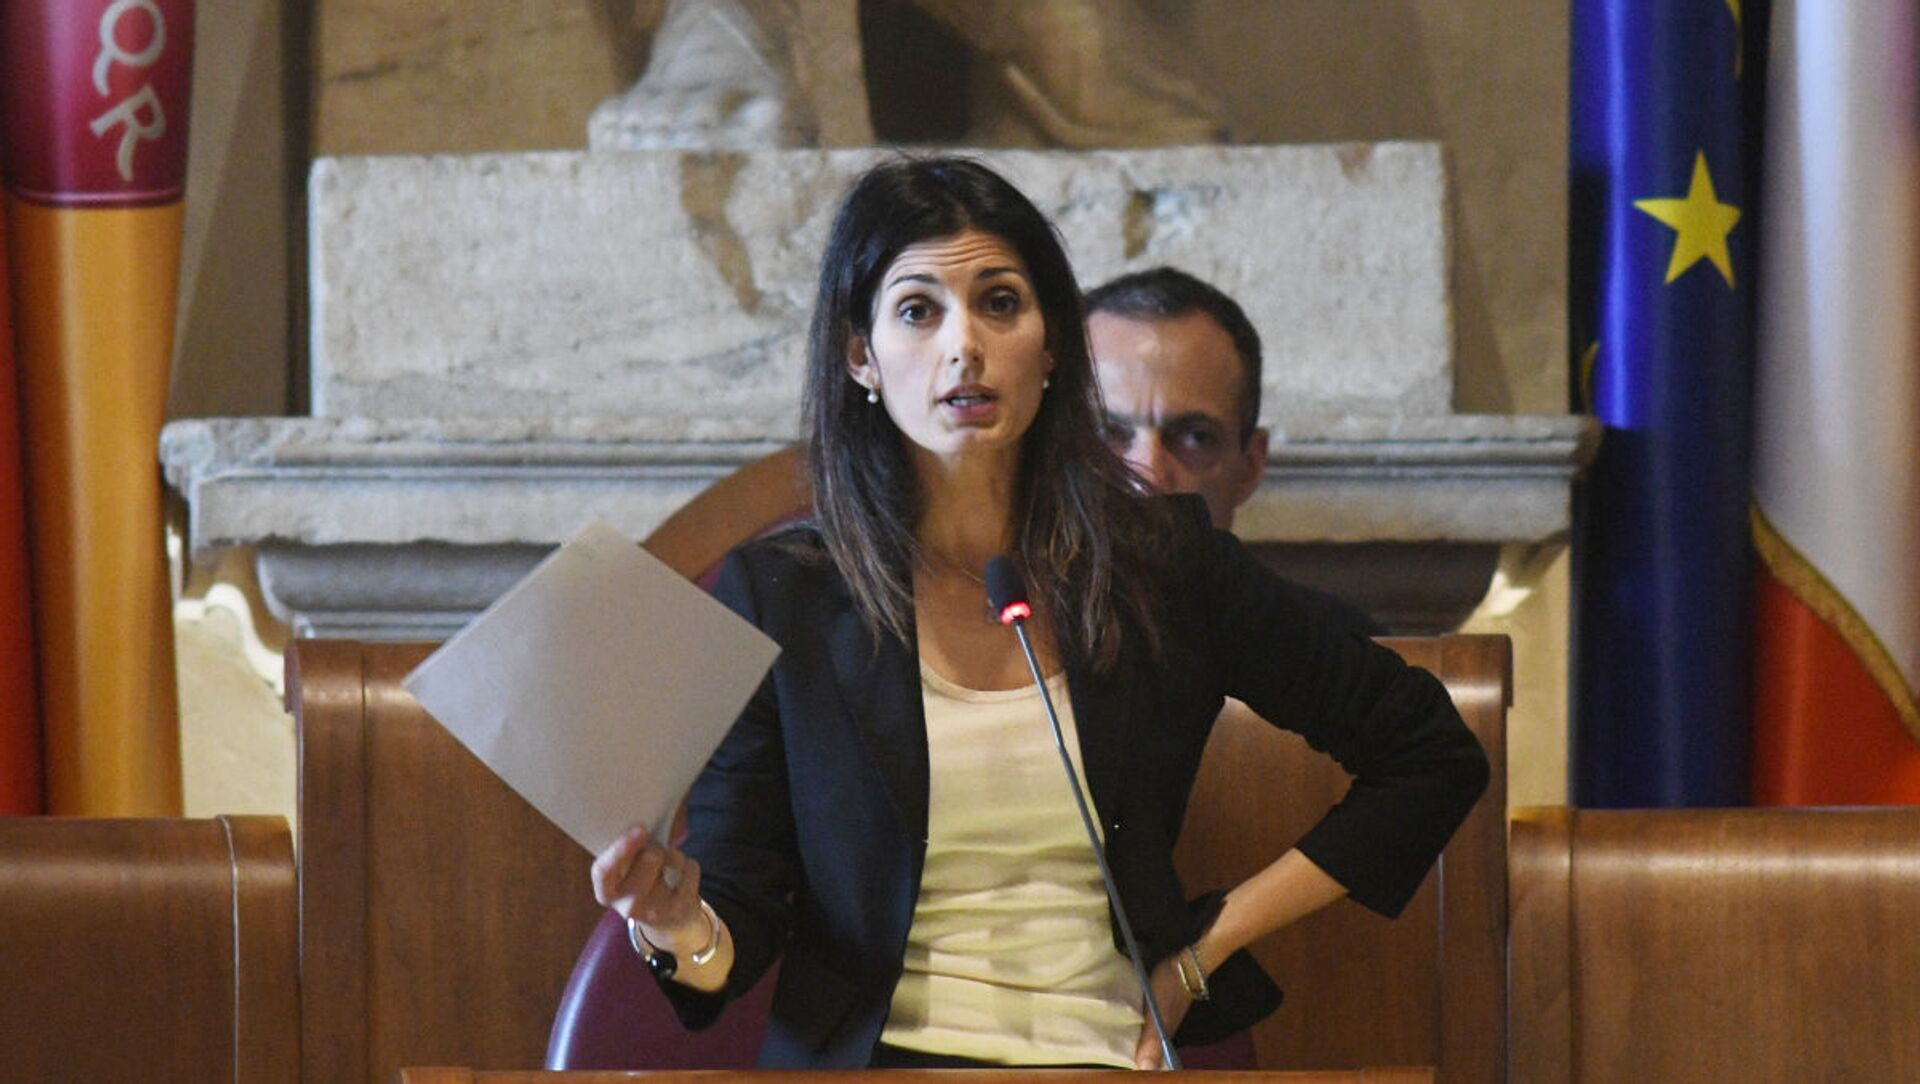 Virginia Raggi, sindaco di Roma Capitale - Sputnik Italia, 1920, 17.02.2021